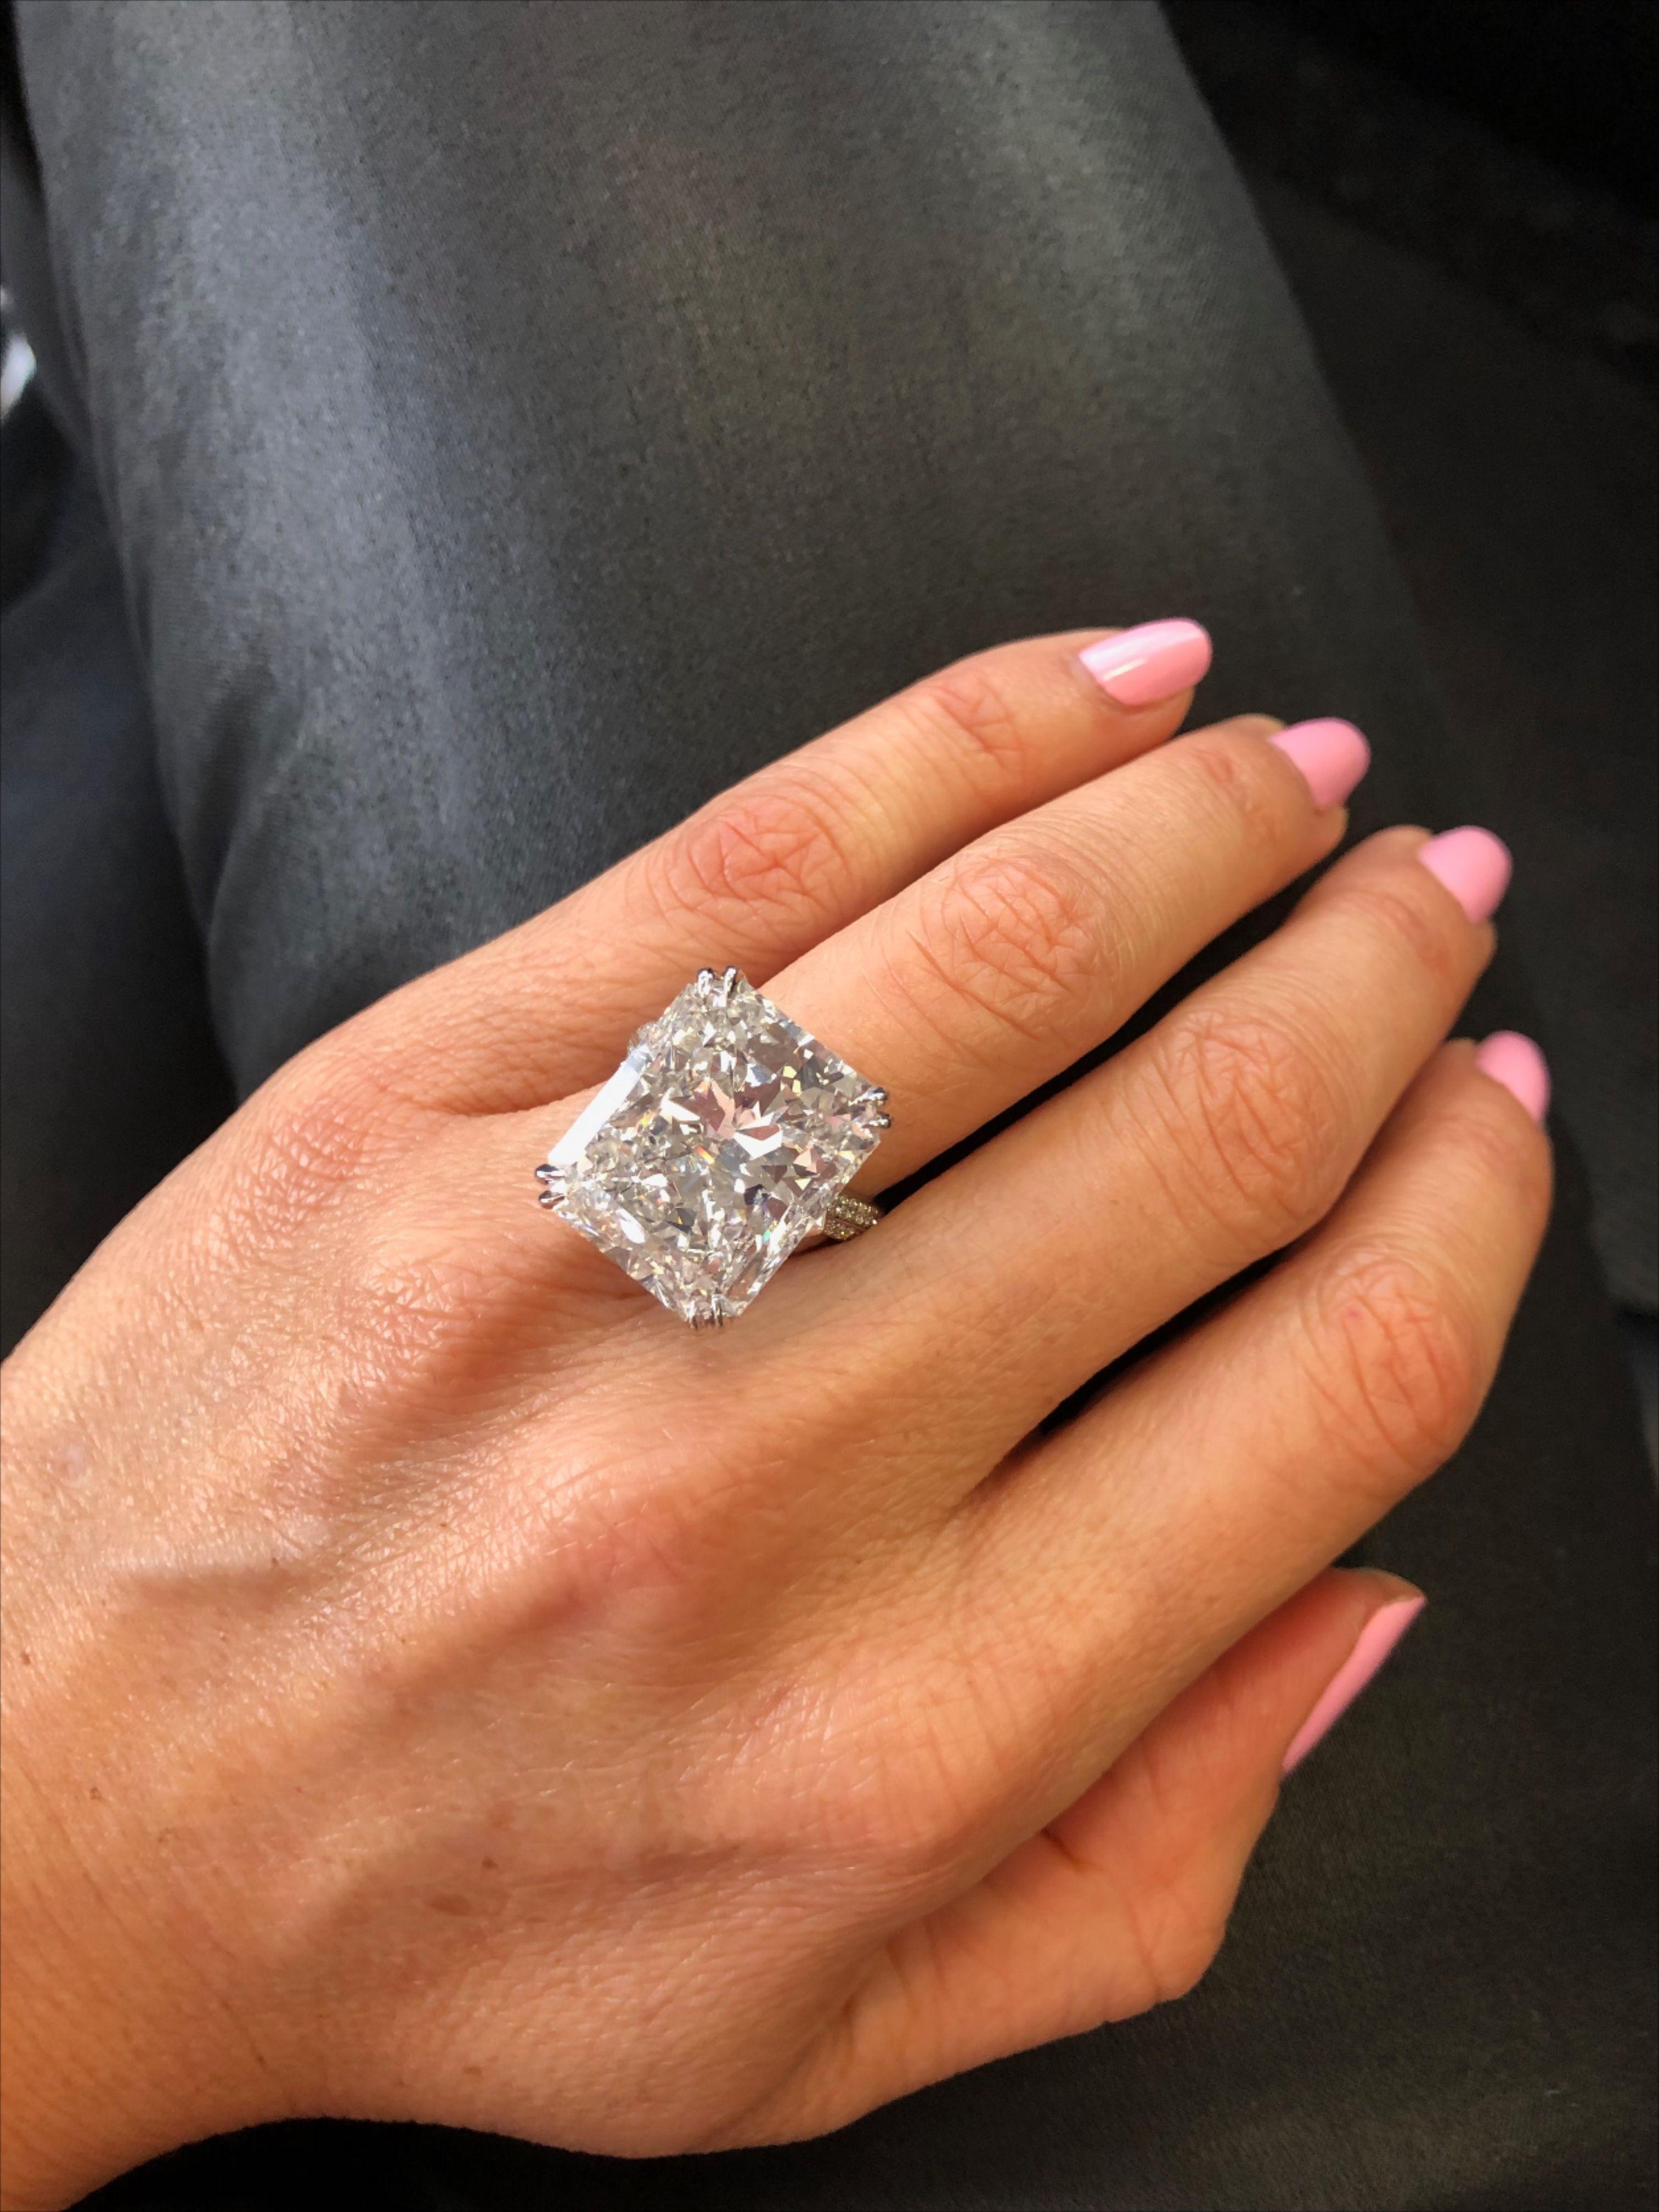 20 Carat Engagement Ring Miss Diamond Ring Dream Engagement Rings Diamond Engagement Rings Graff Engagement Ring